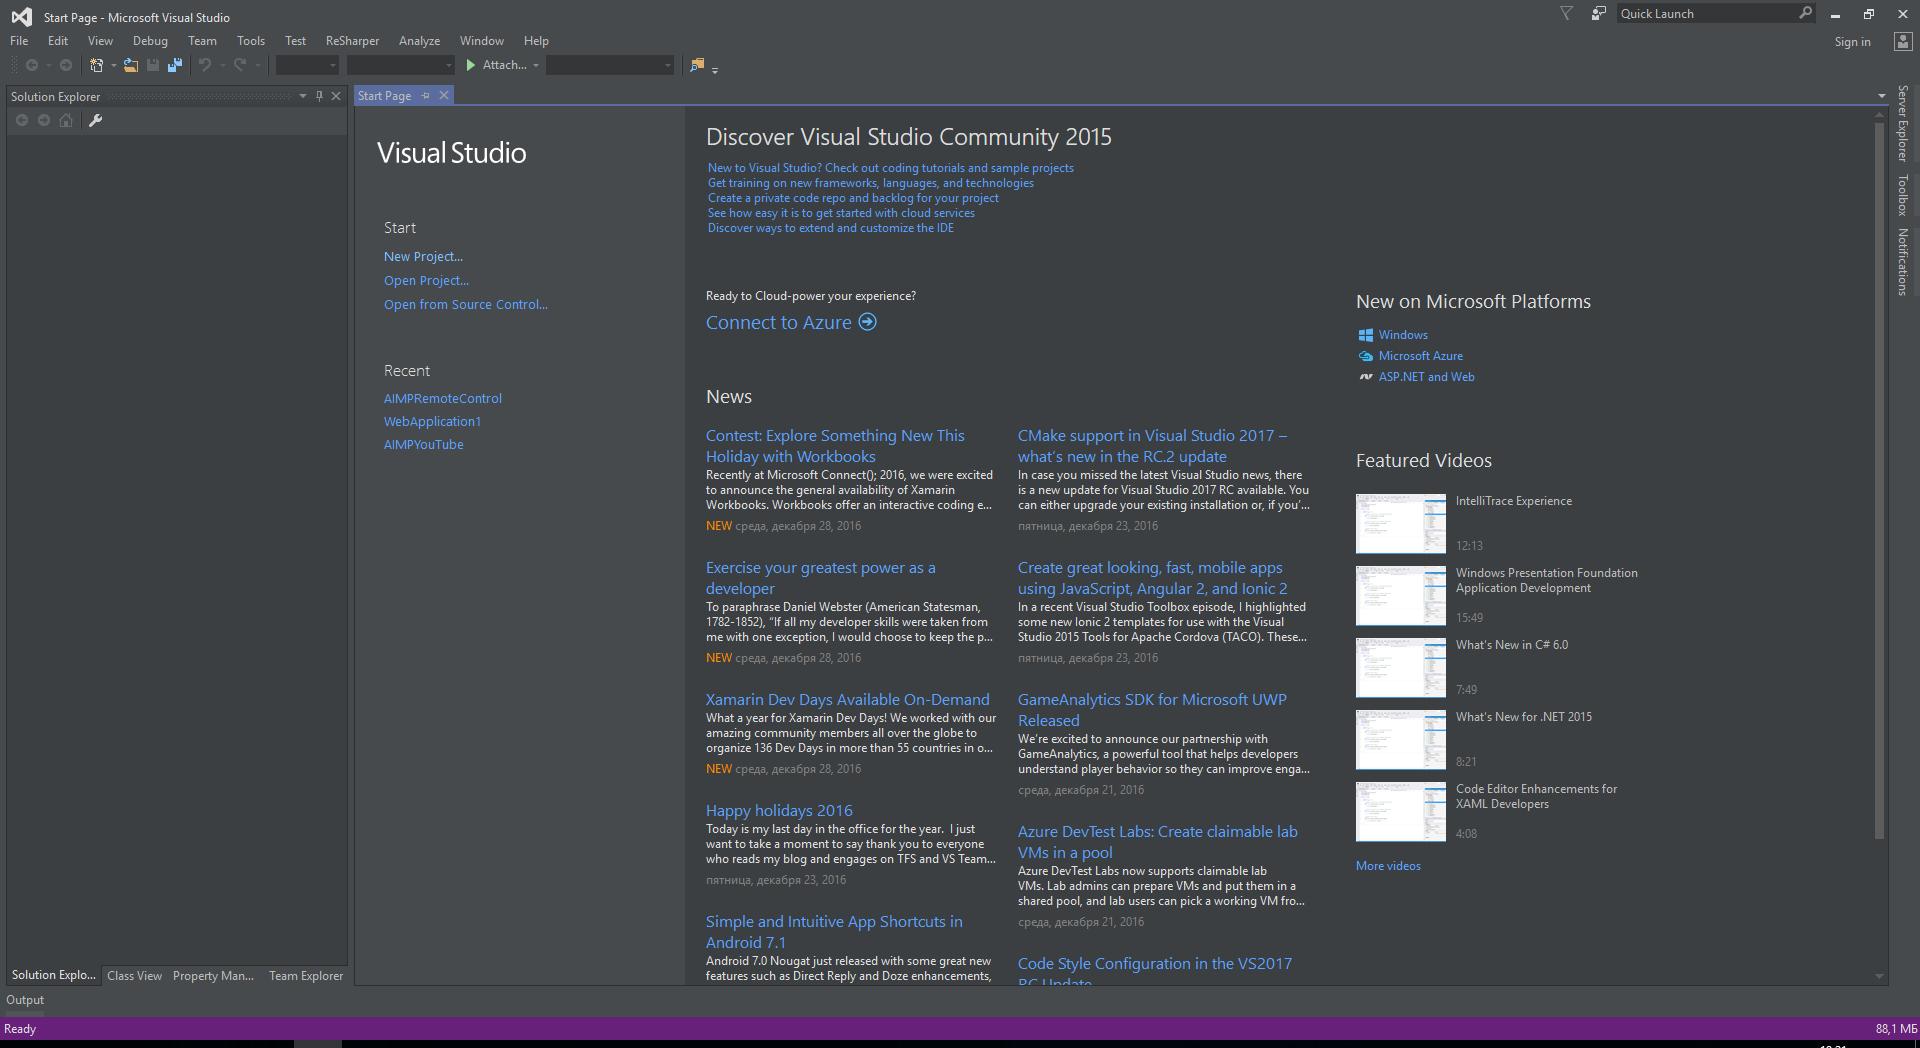 Visual Studio Darcula theme